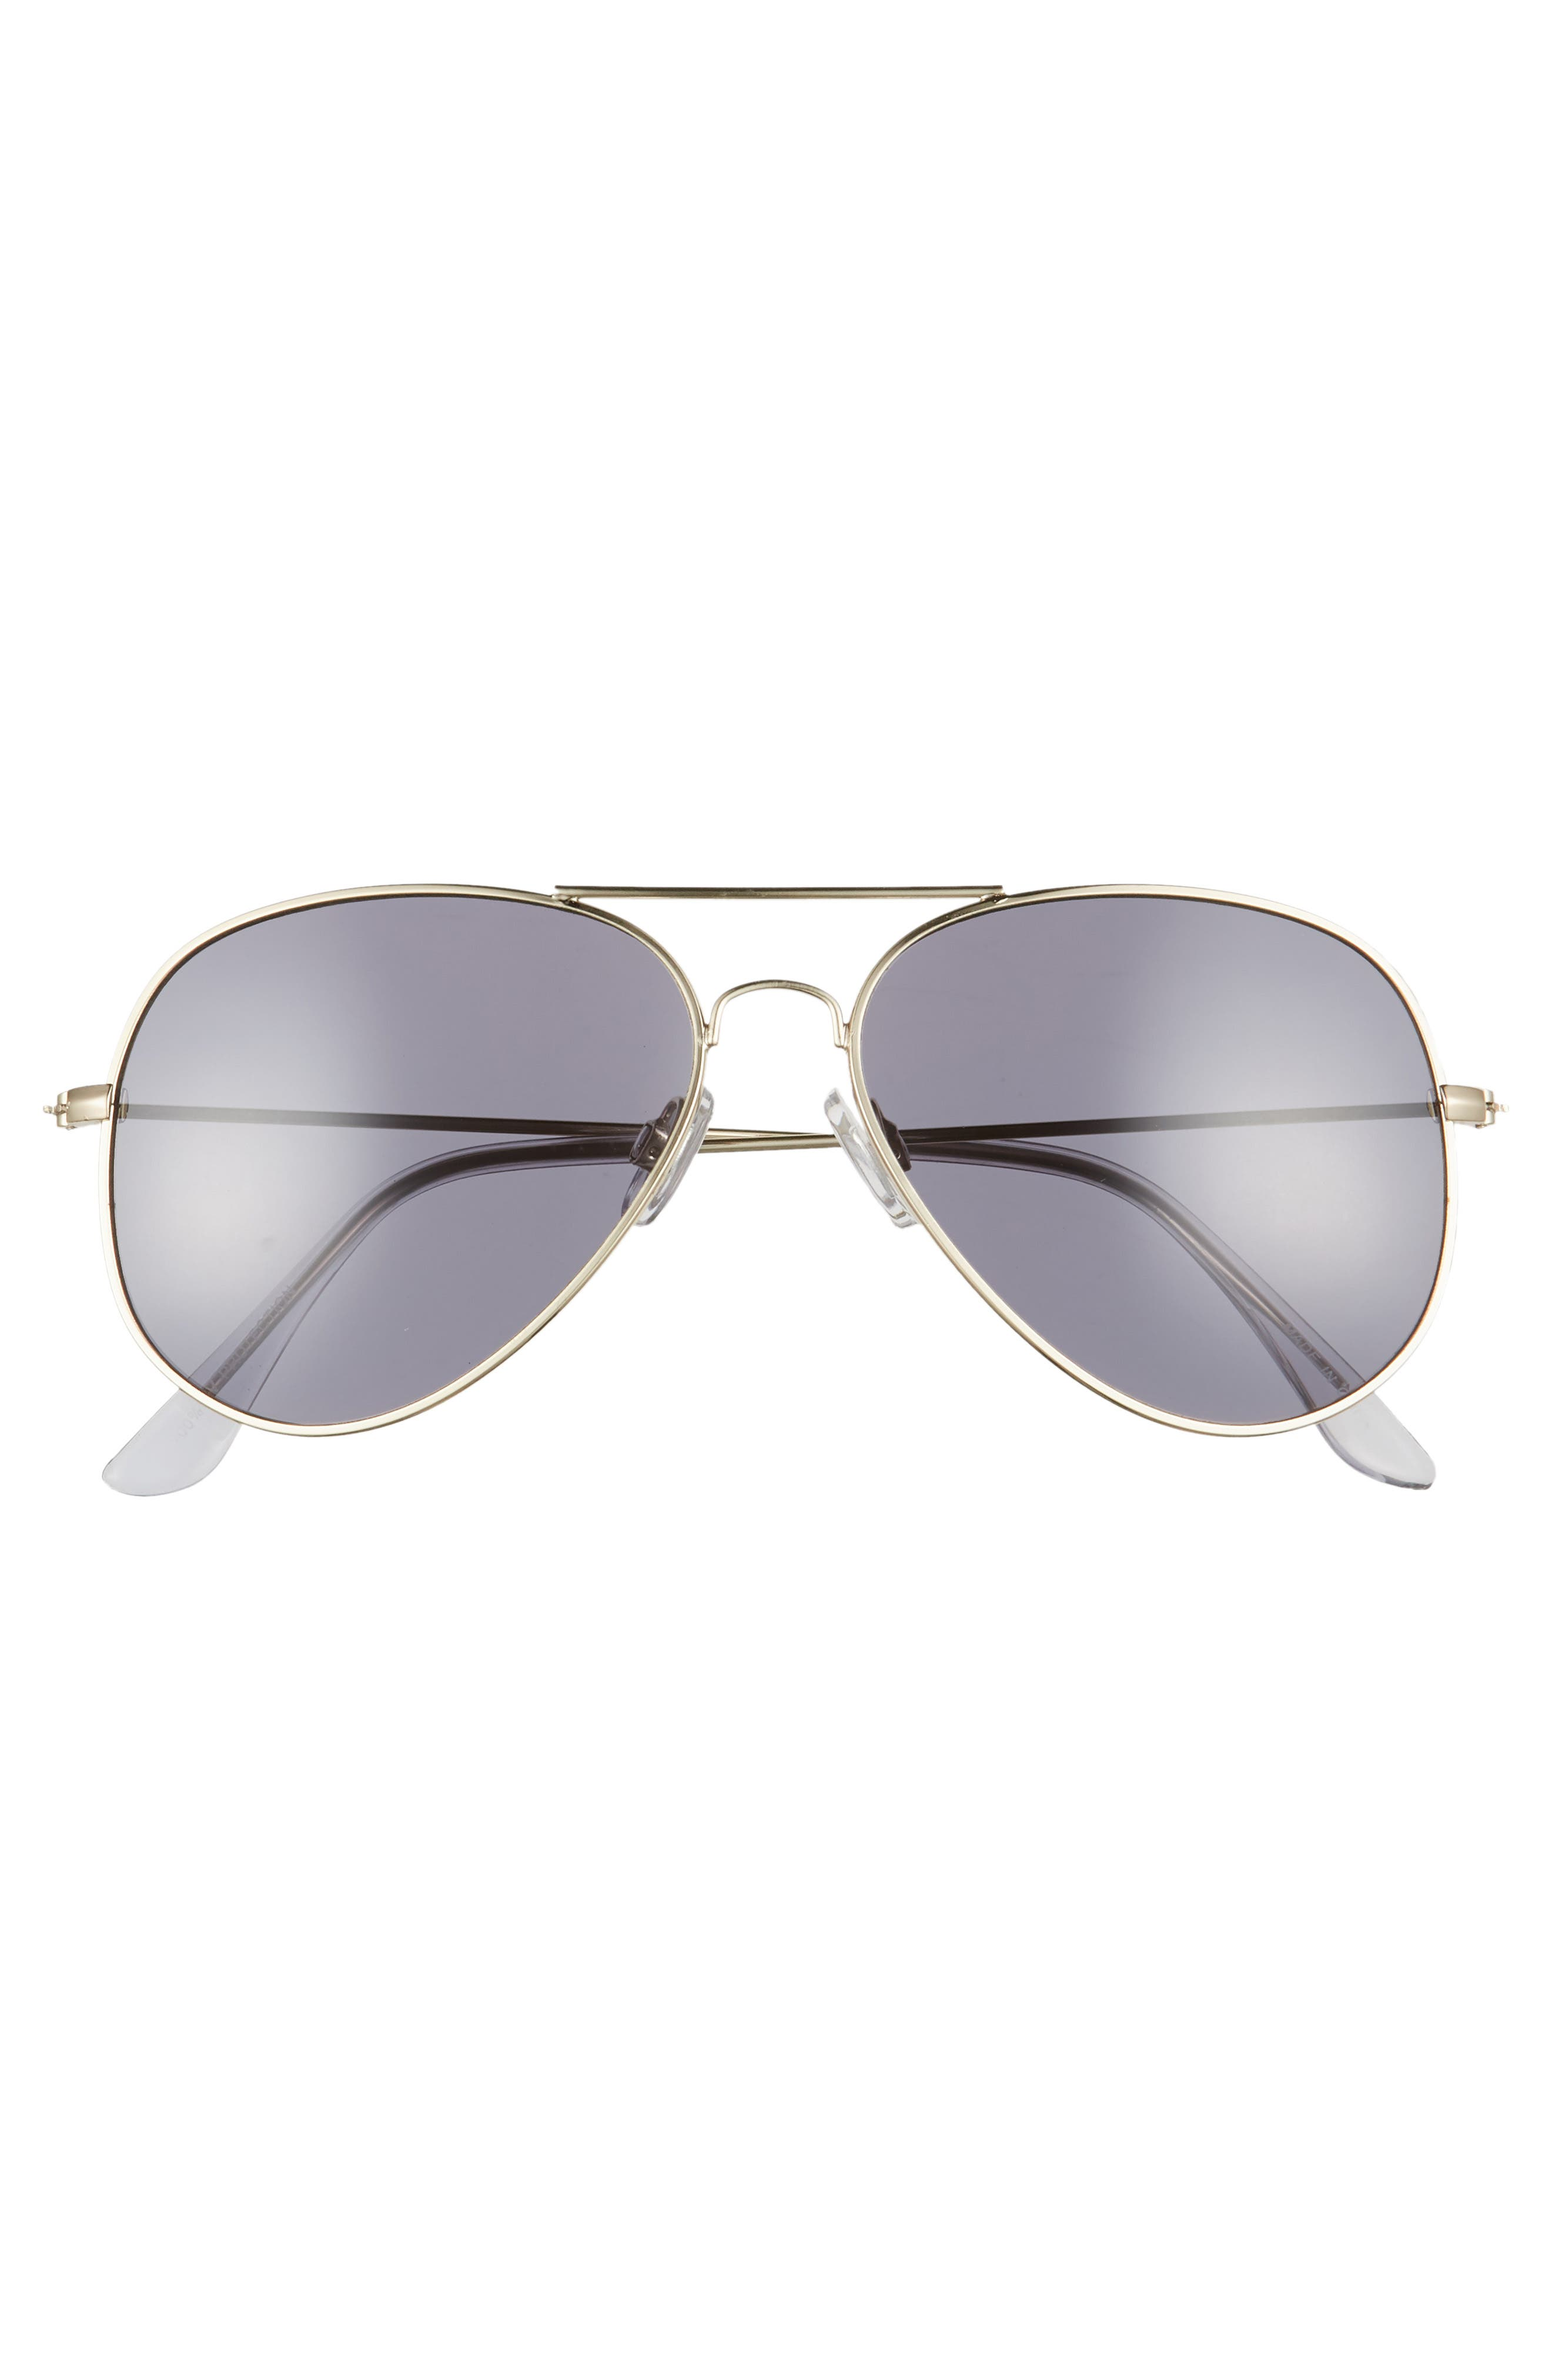 Mirrored Aviator 57mm Sunglasses,                             Alternate thumbnail 3, color,                             Gold/ Smoke